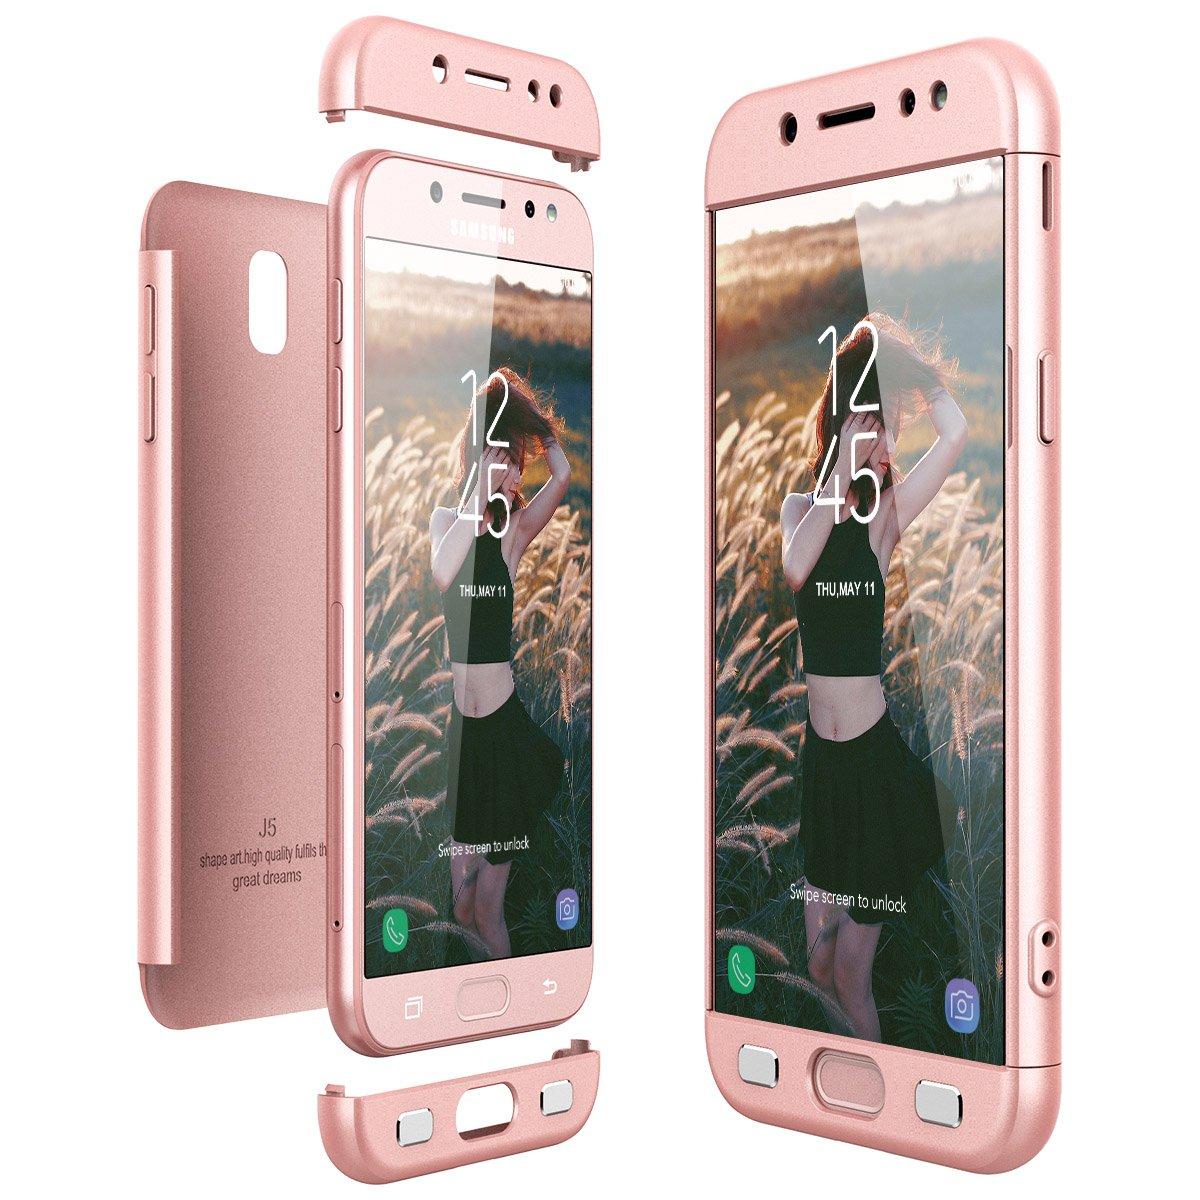 CE-Link Funda Samsung Galaxy J5 2017, Carcasa Fundas para Samsung Galaxy J5 2017, 3 en 1 Desmontable Ultra-Delgado Anti-Arañazos Case Protectora - Oro ...